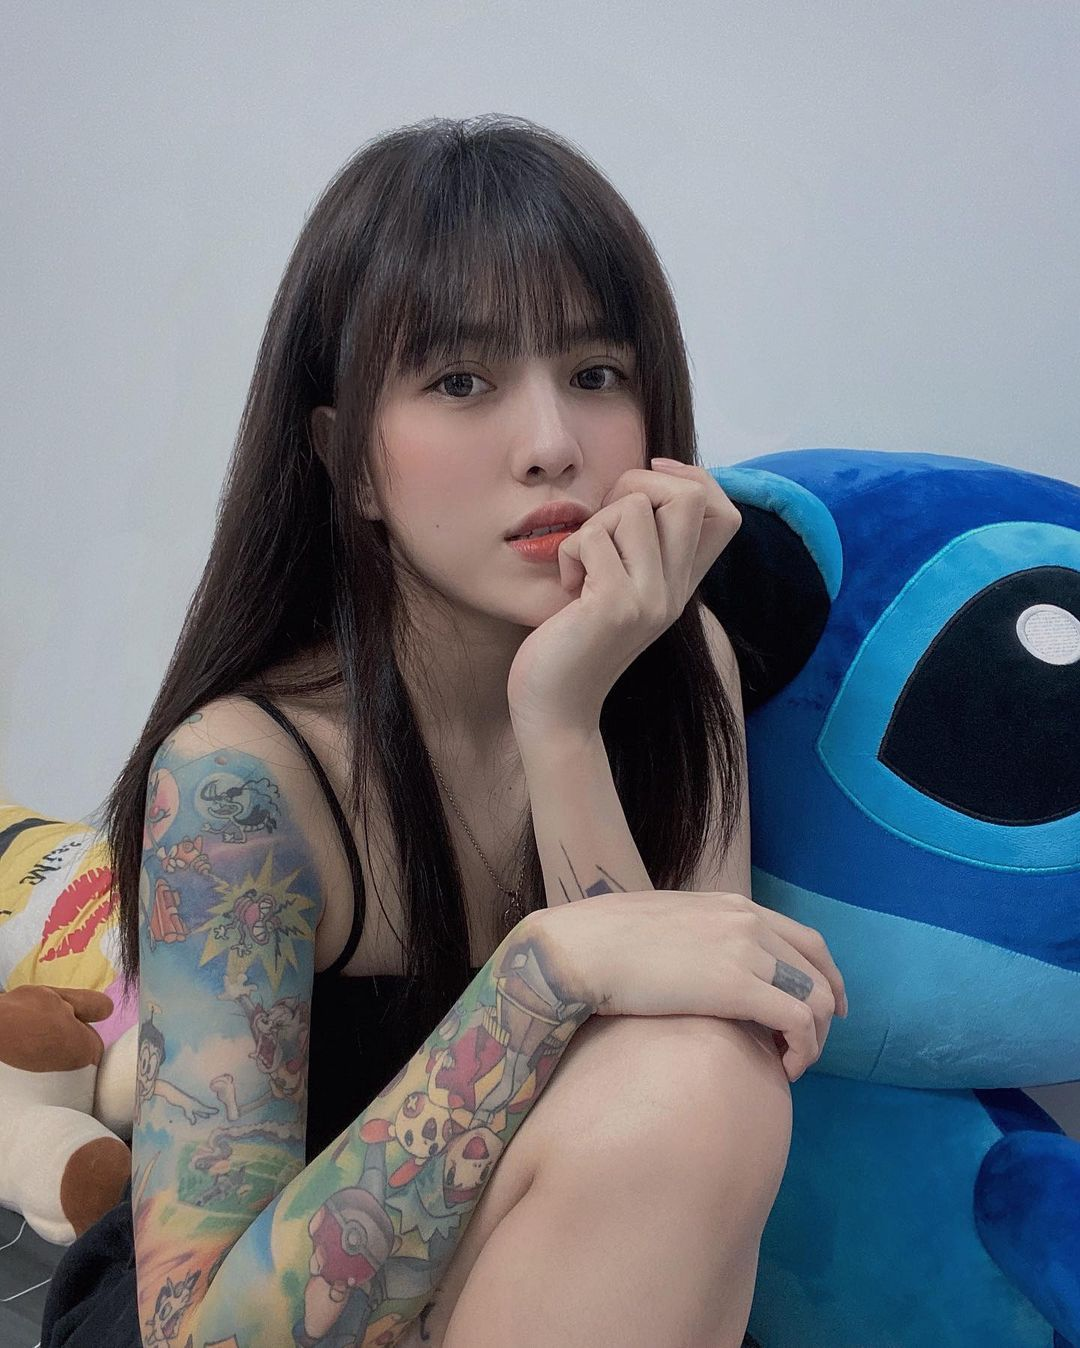 hot girl xam tro bii trinh - elle man (3)